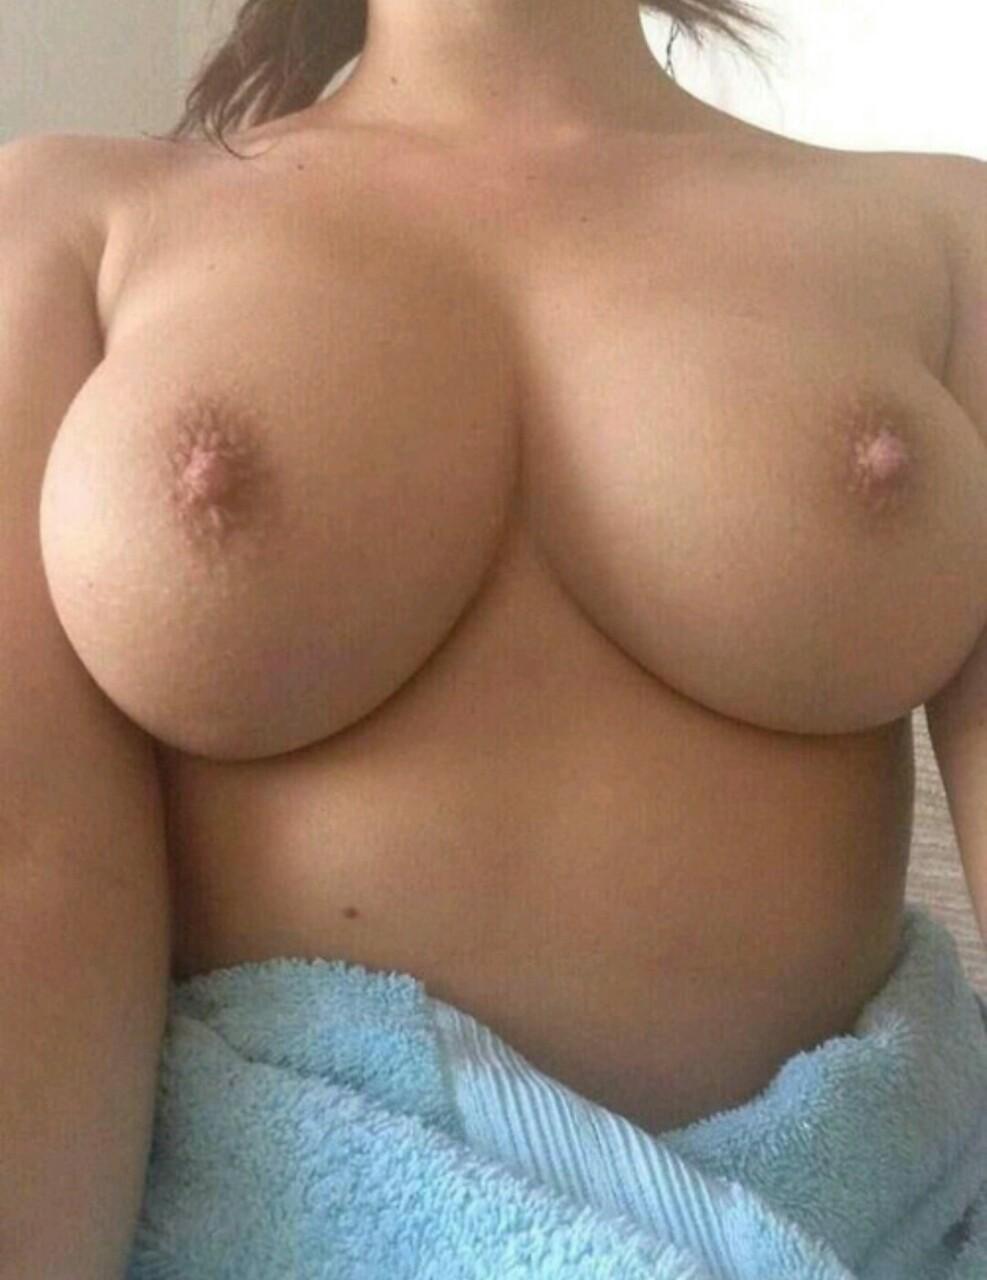 интимфото с 9 размером груди